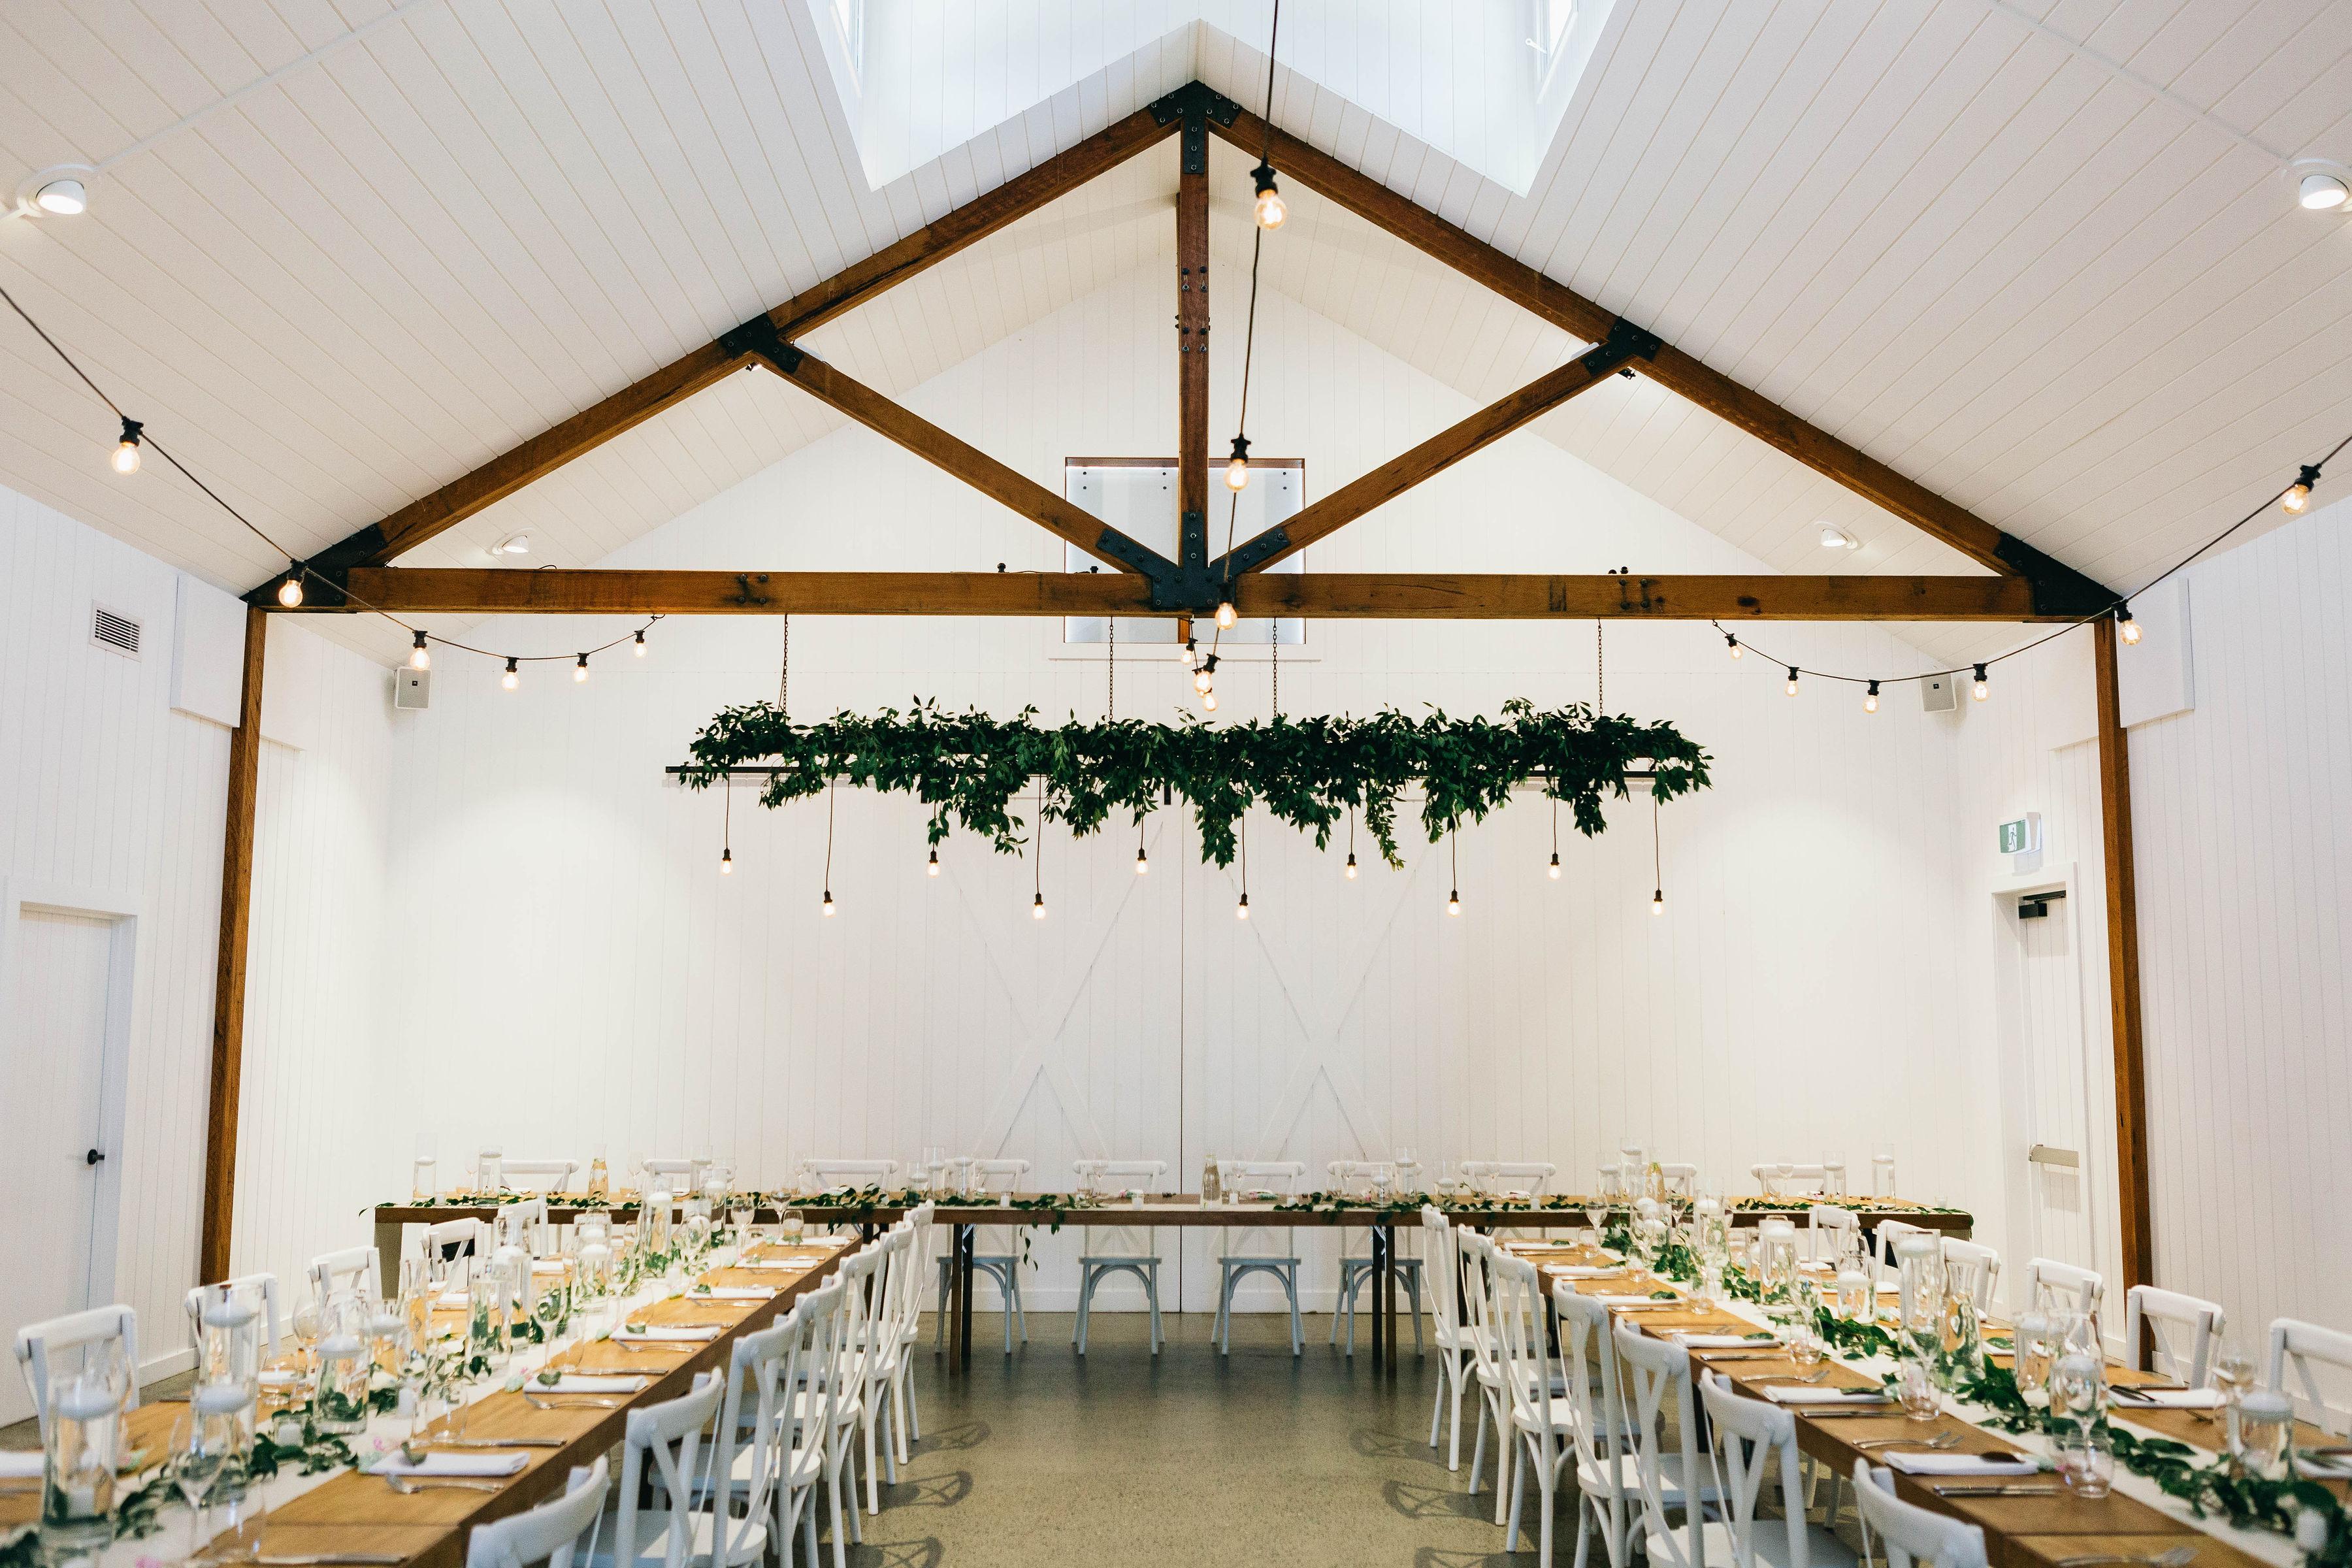 Summergrove barn wedding